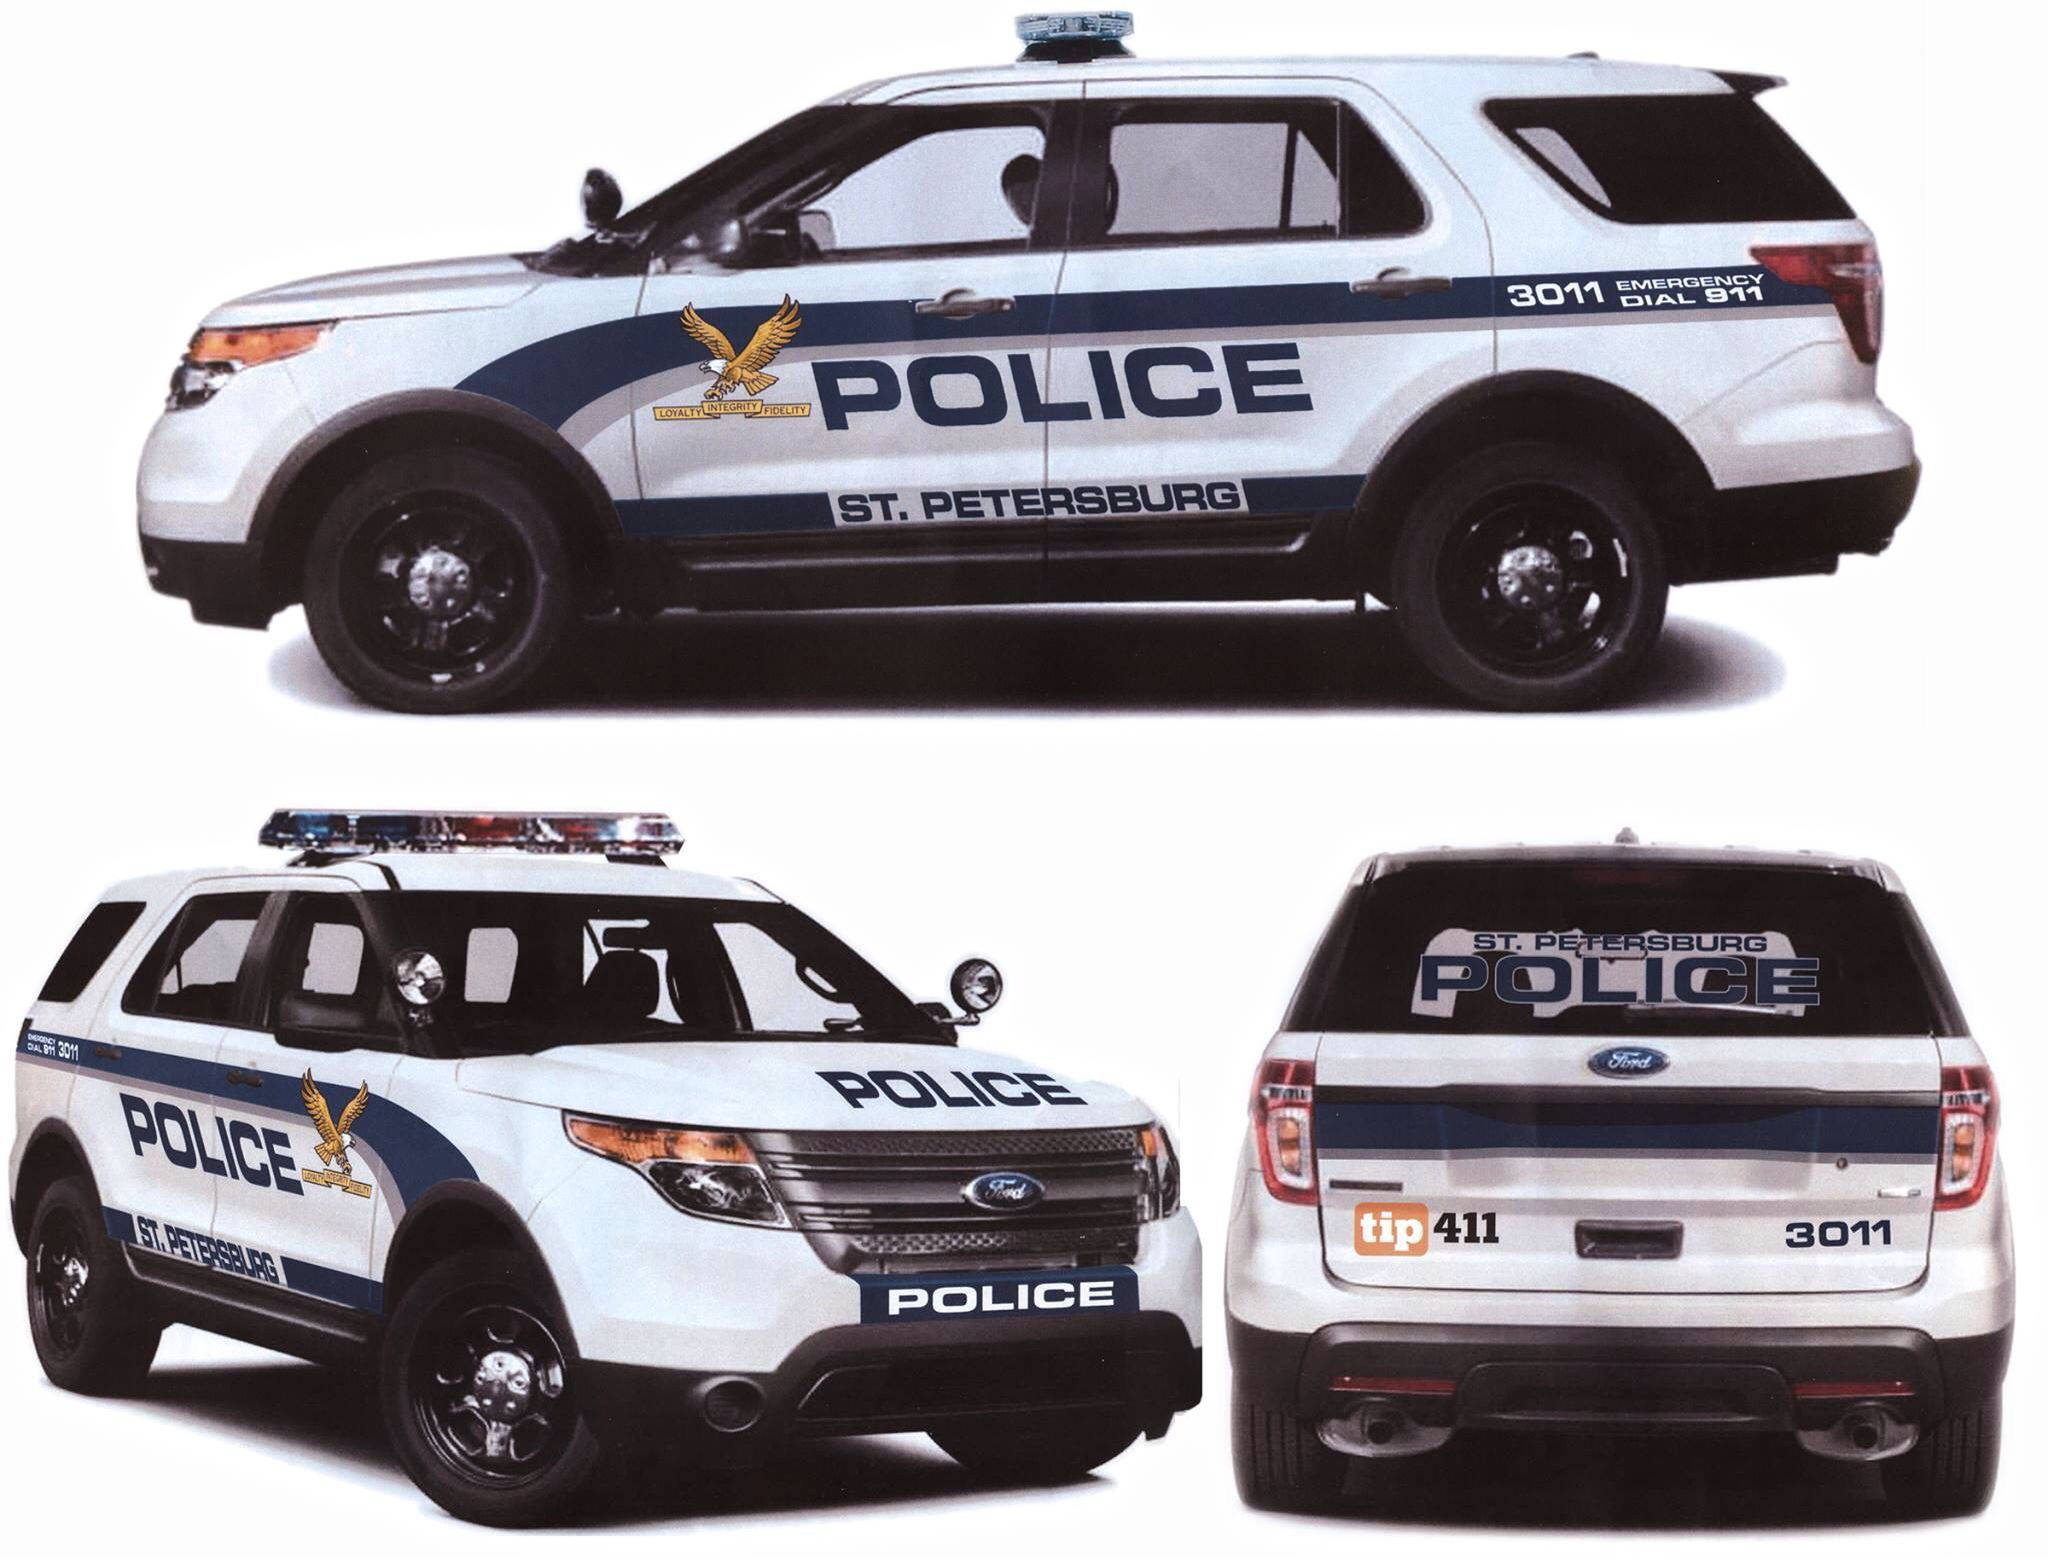 St petersburg florida police police cars pinterest st petersburg florida police cars and cars